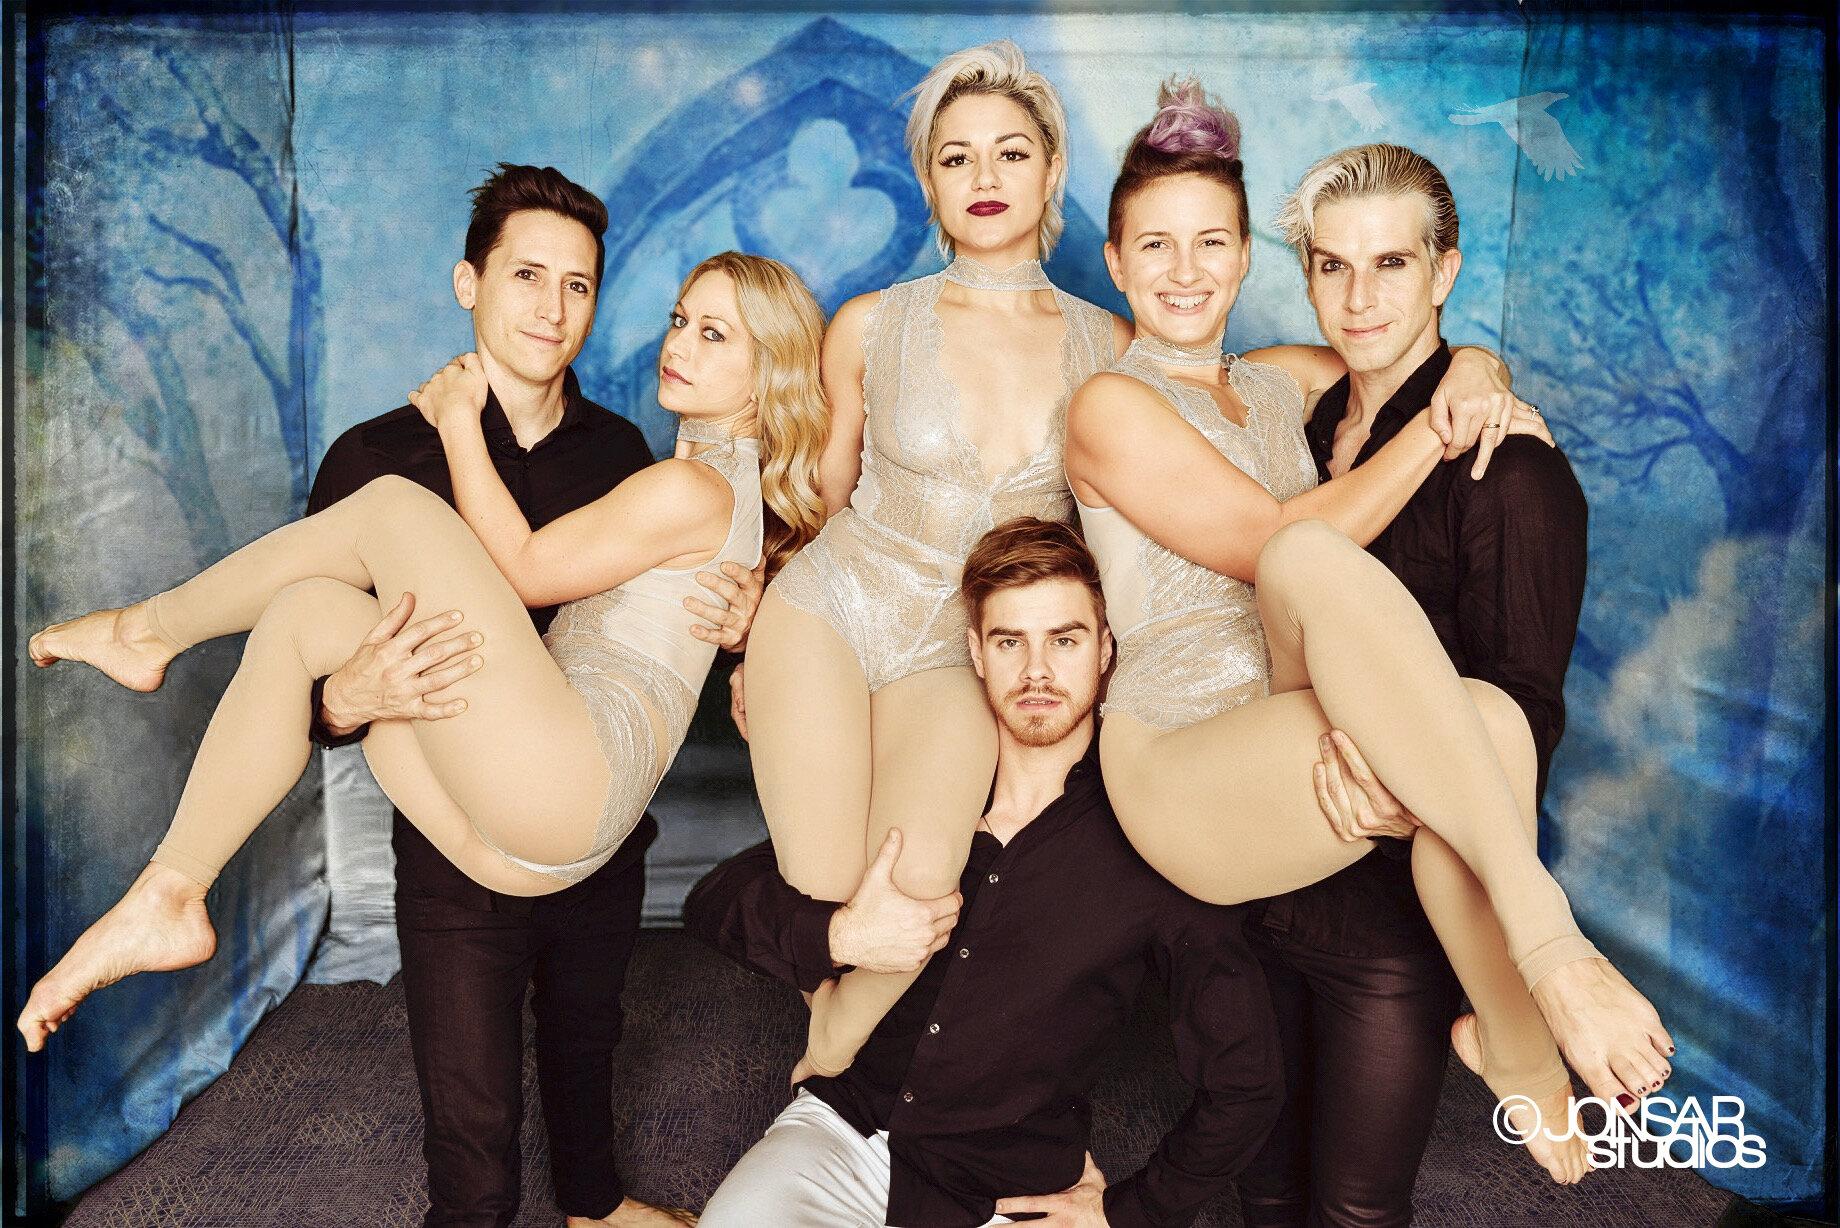 Portrait of Team of Acrobat Performers on Custom Background